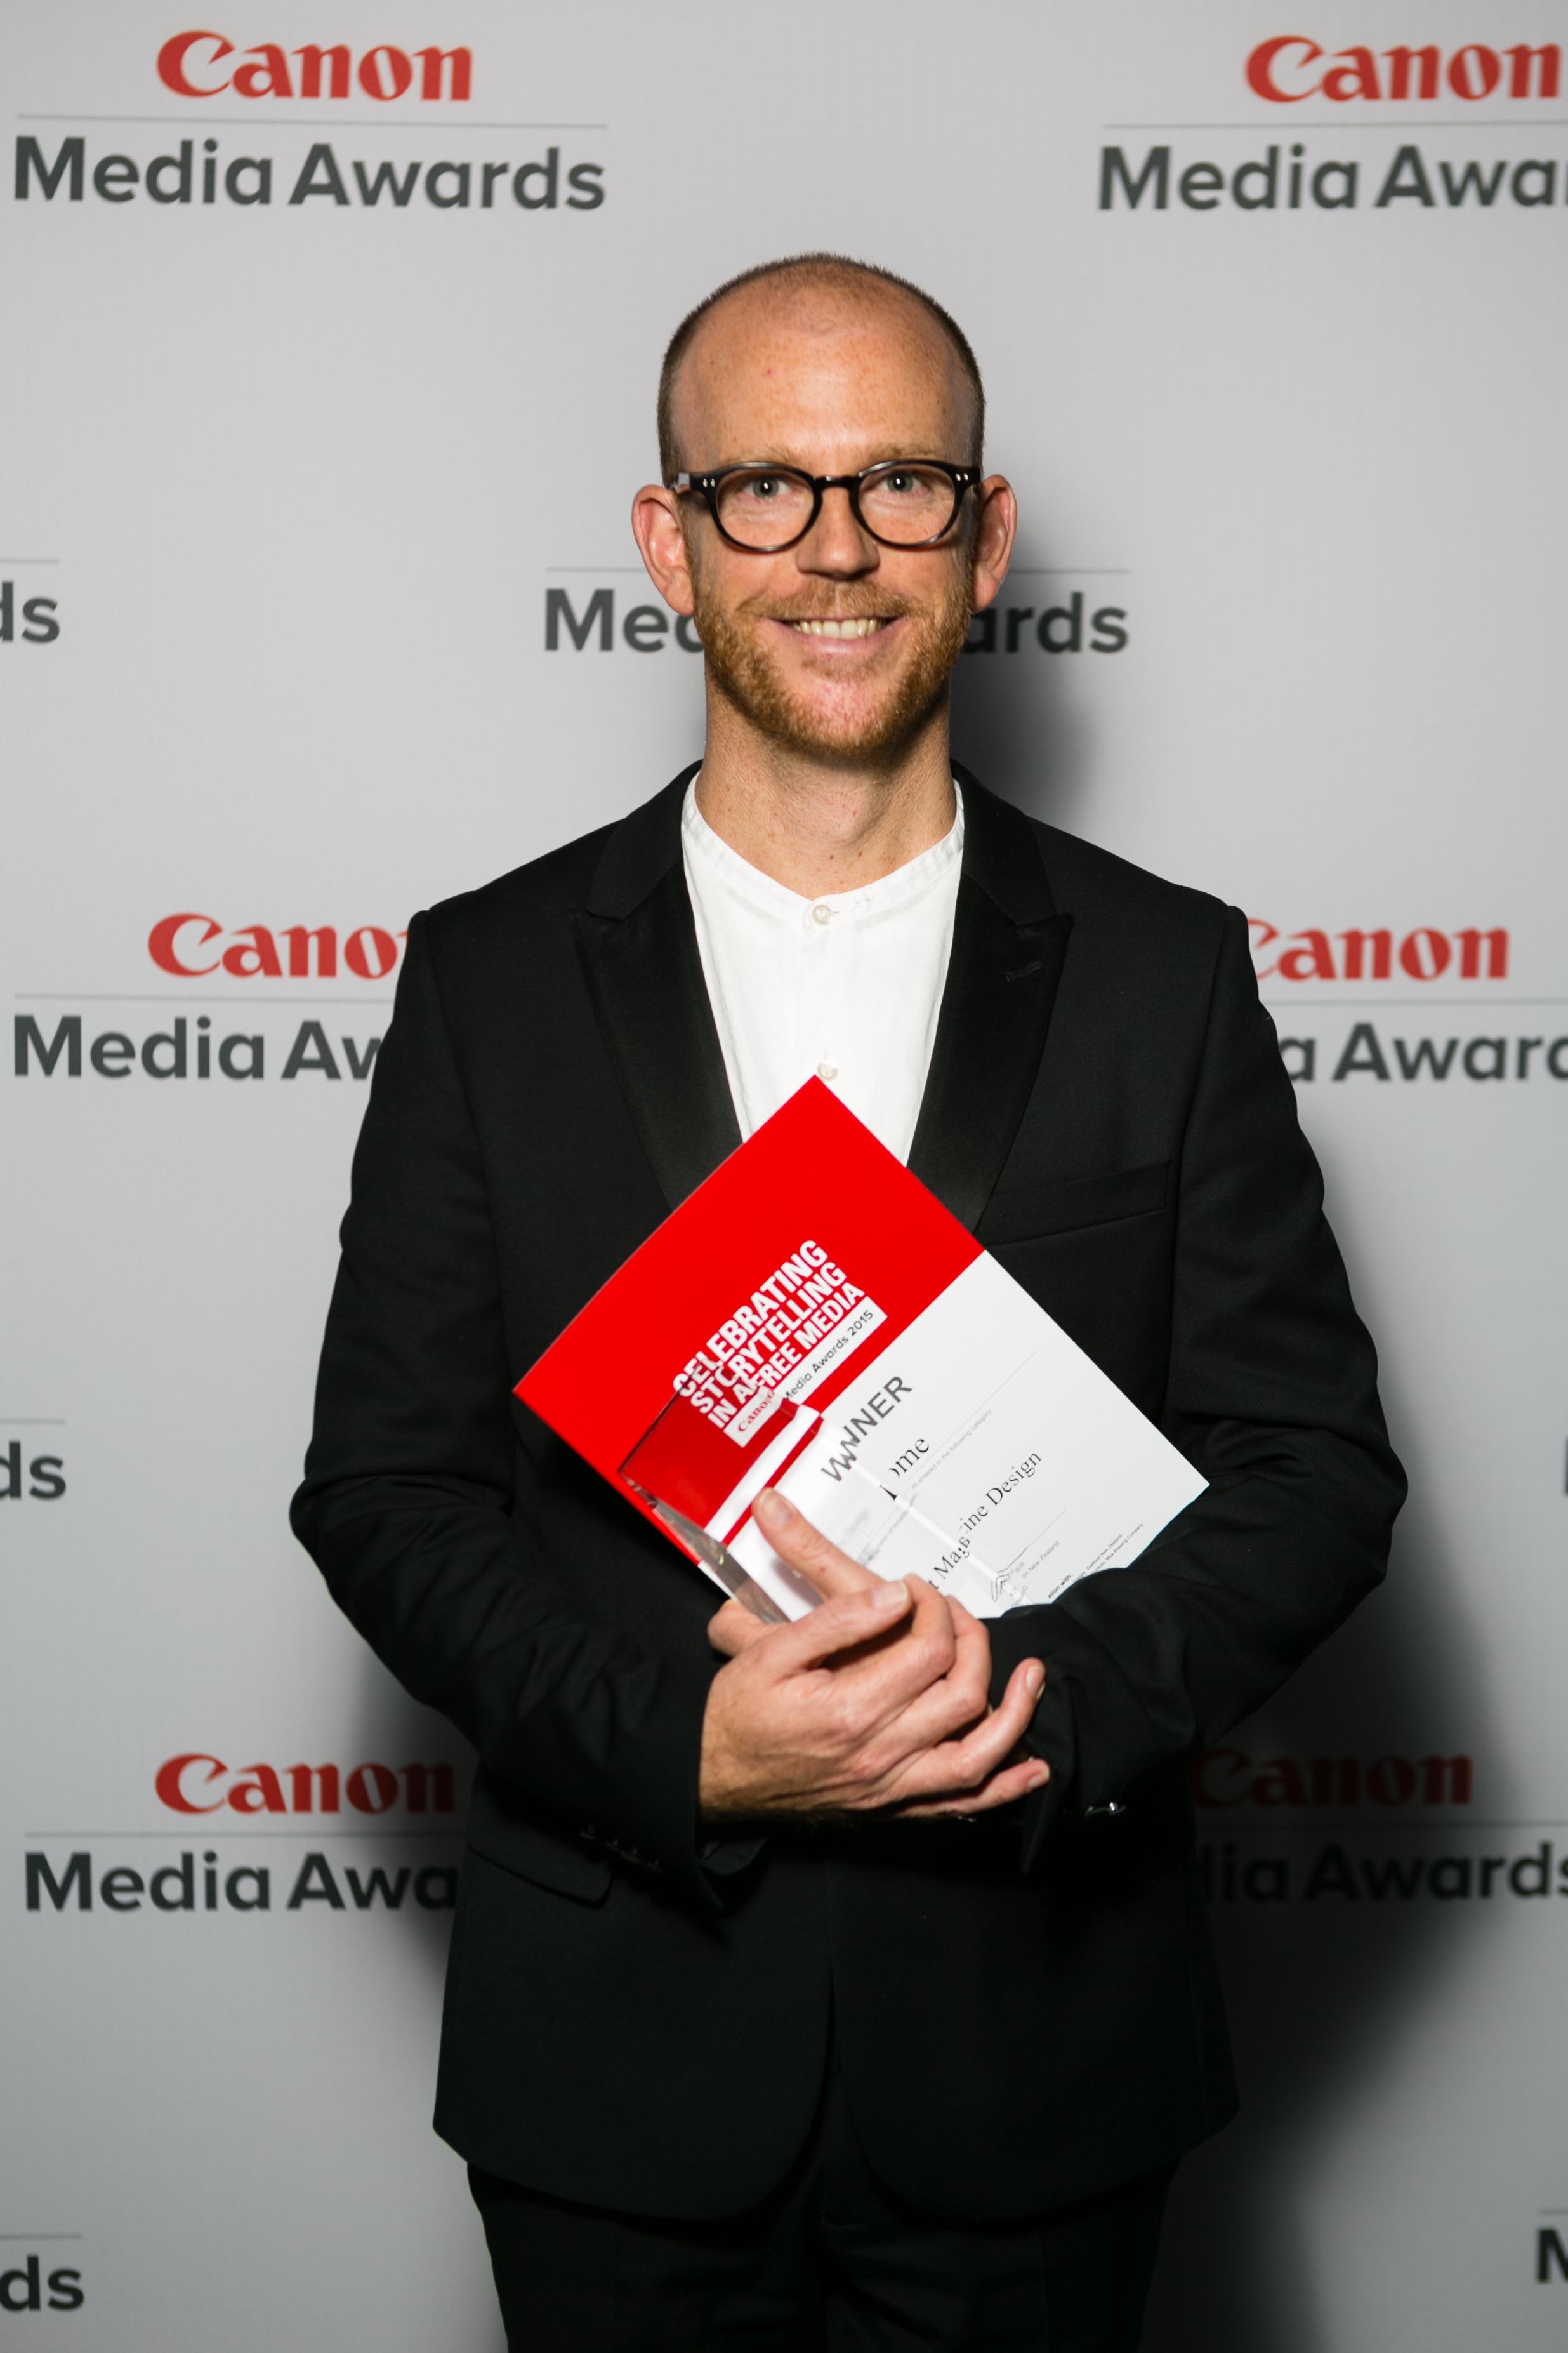 canon_media_awards_2015_interlike_nz_clinton_tudor-5890-174.jpg